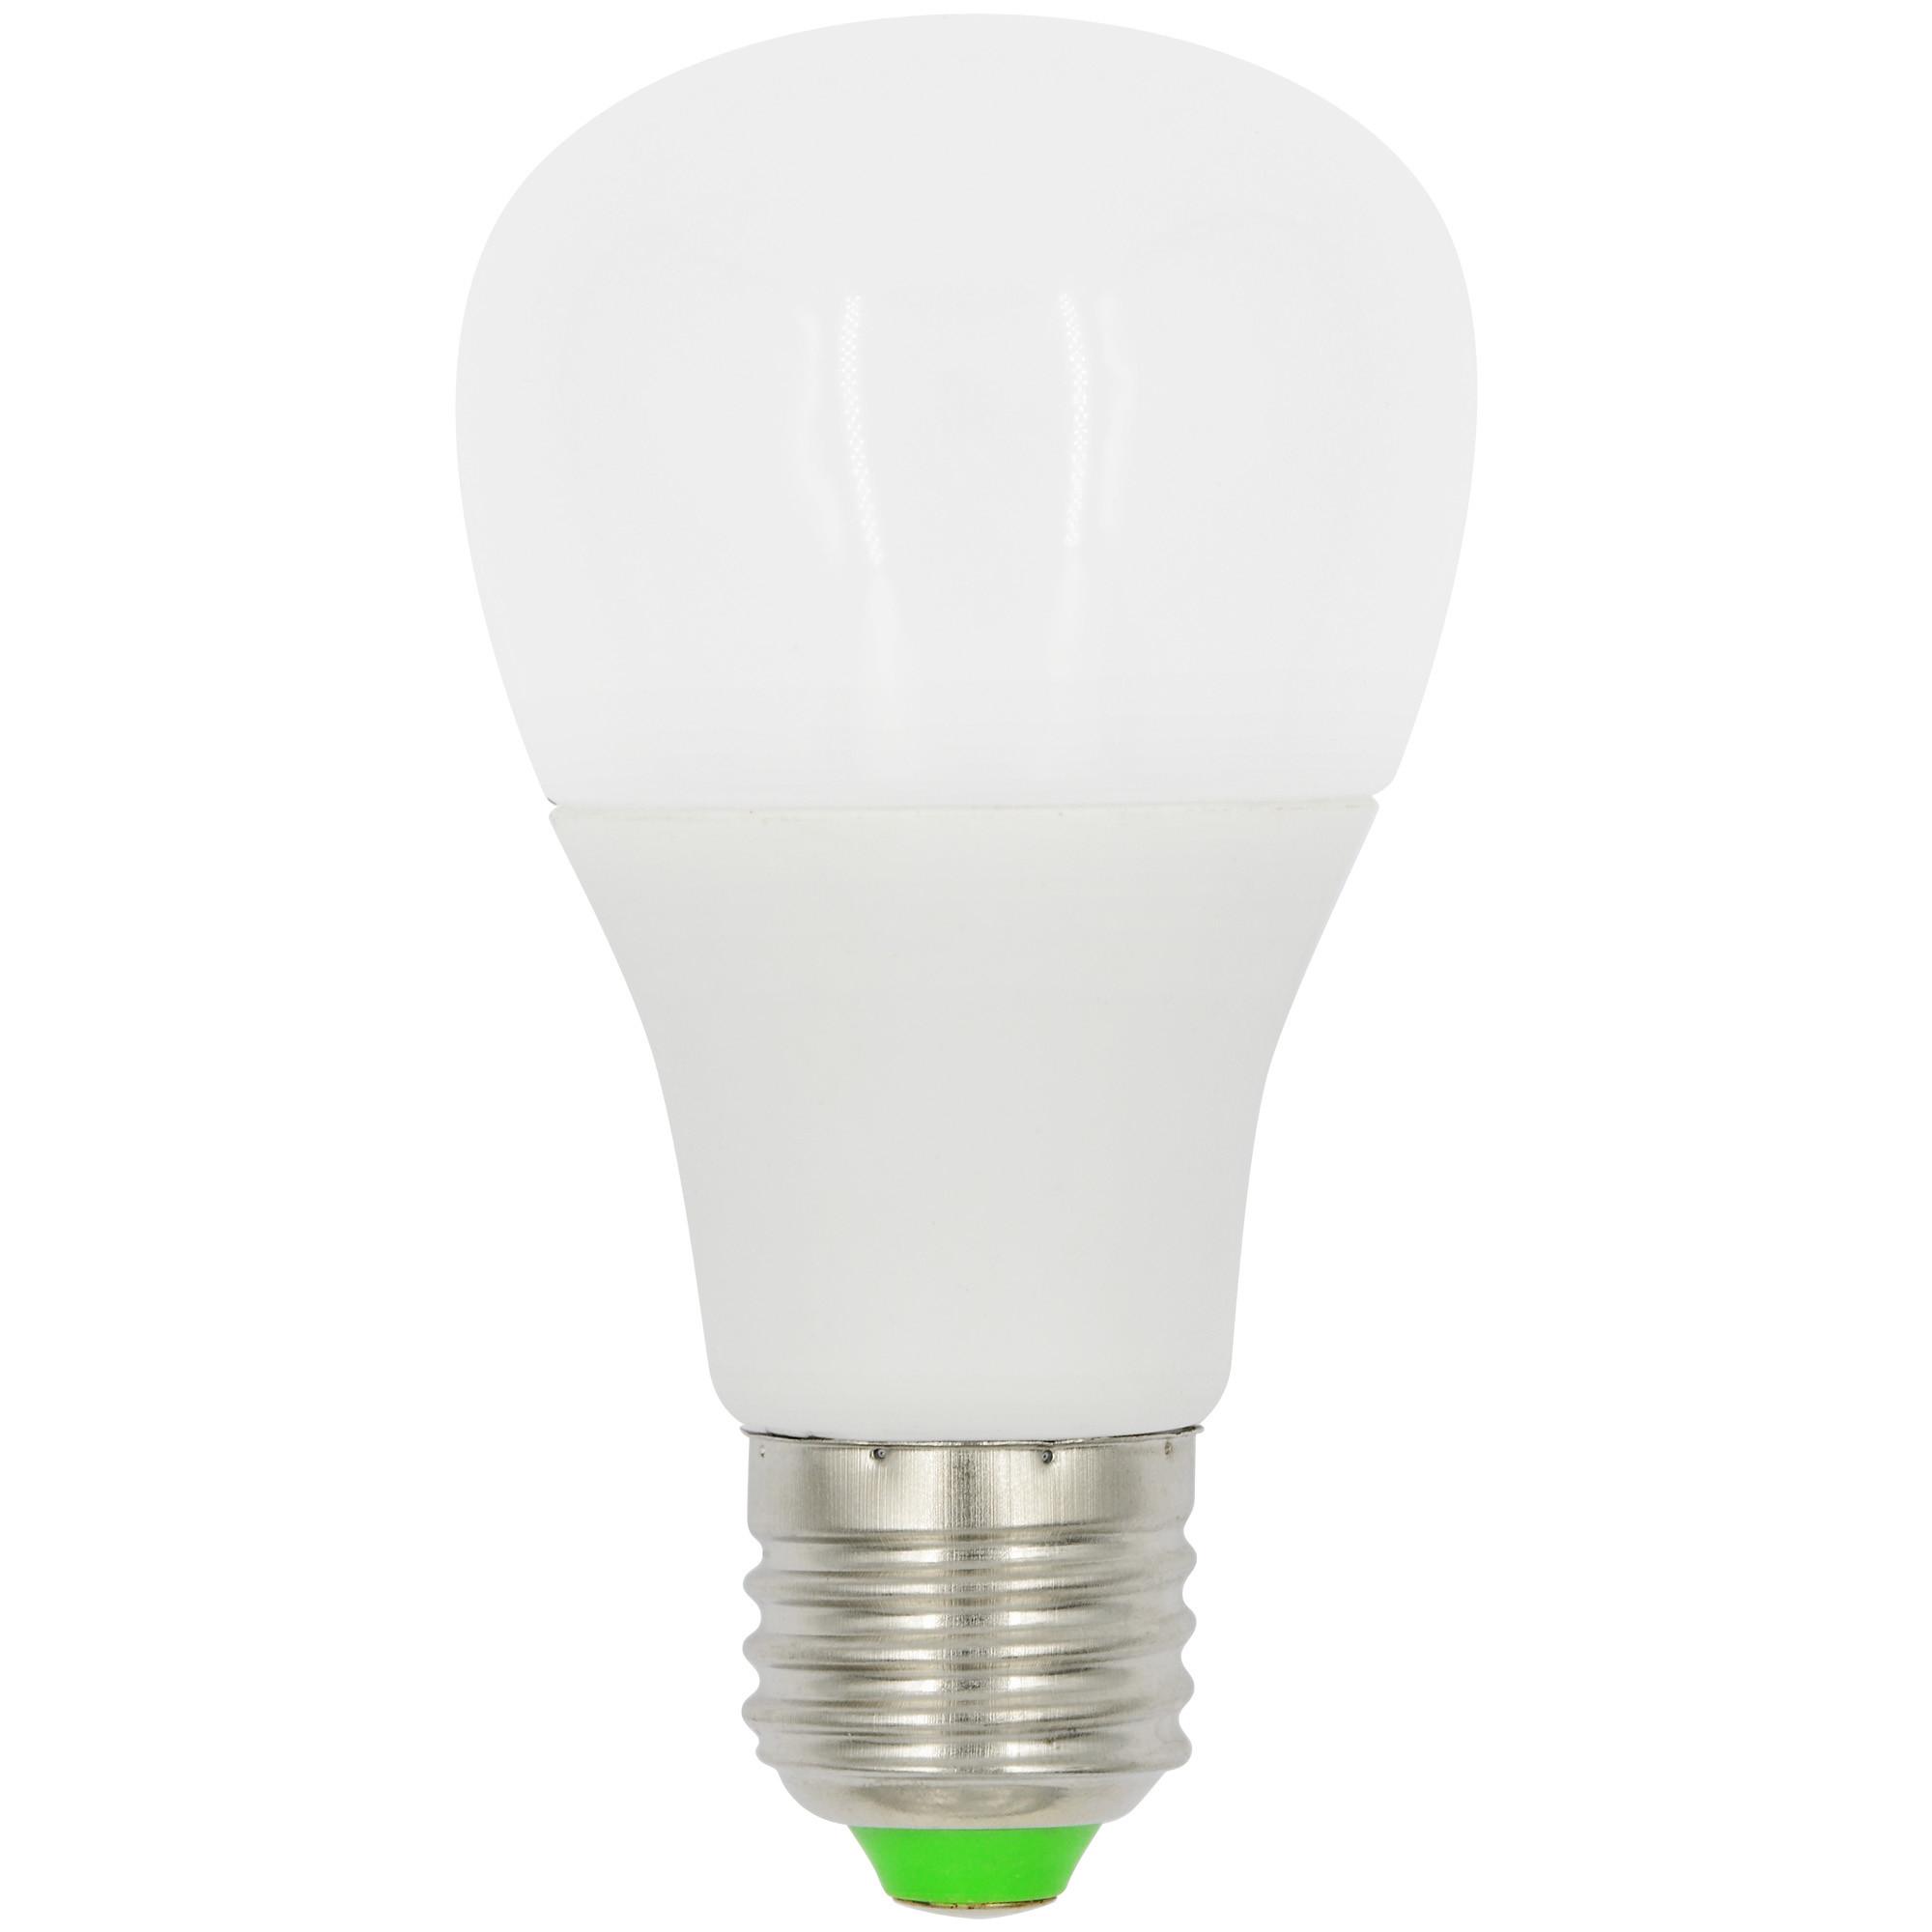 e27 7w led globe light 14x 5730 smd leds led lamp in cool white energy saving lamp led lights. Black Bedroom Furniture Sets. Home Design Ideas